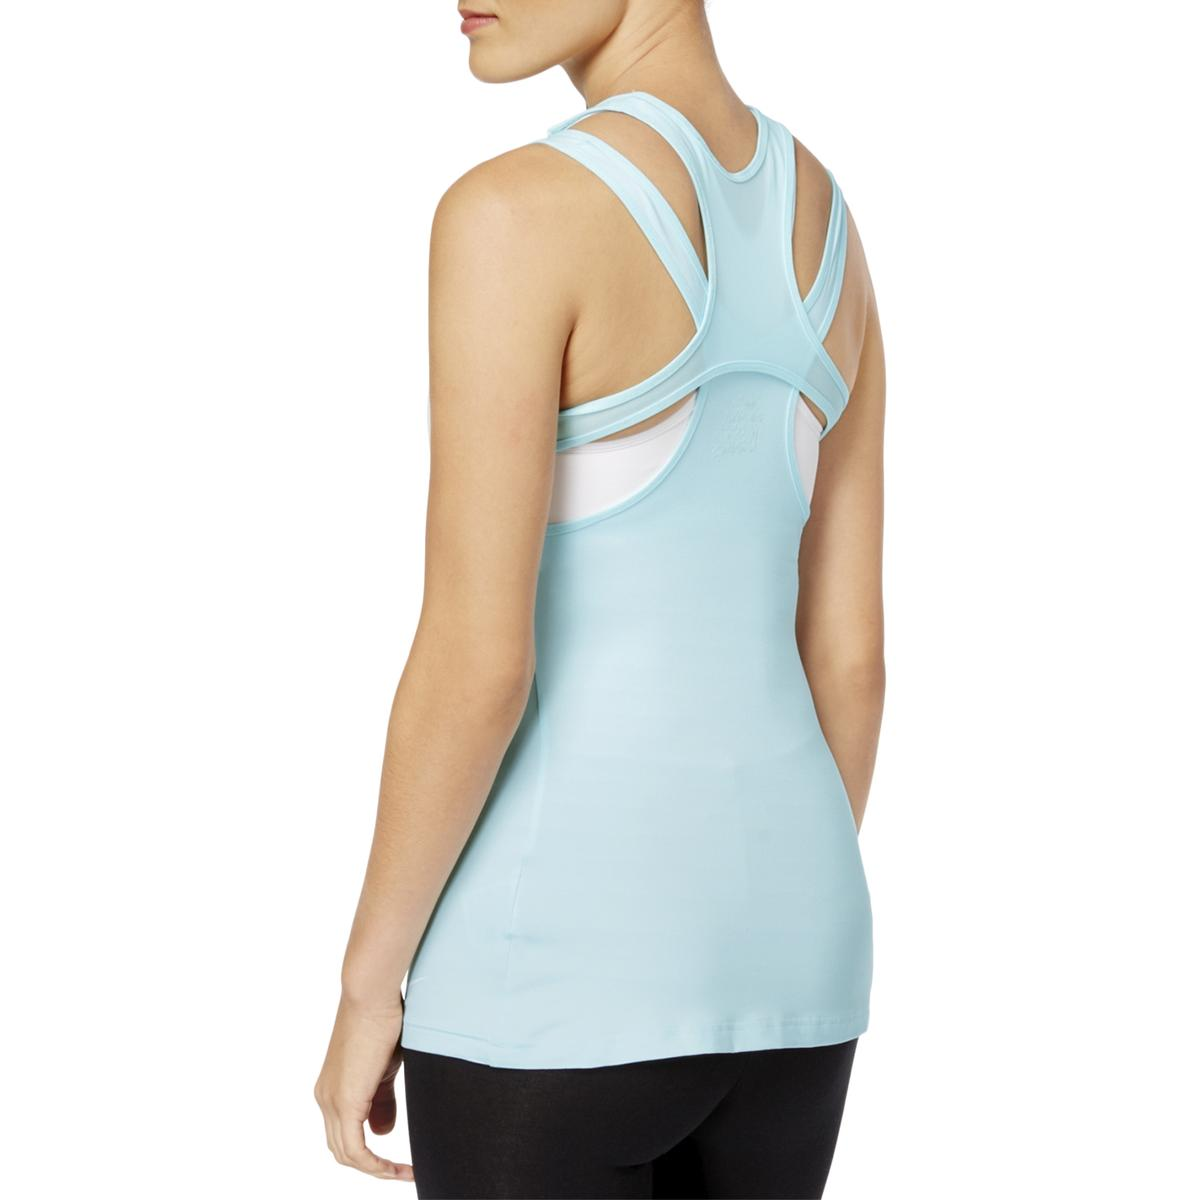 Athletic Bhfo tirantes Fitness Camiseta Nike de Womens 5376 Mesh Racerback nS08Sq6vTg